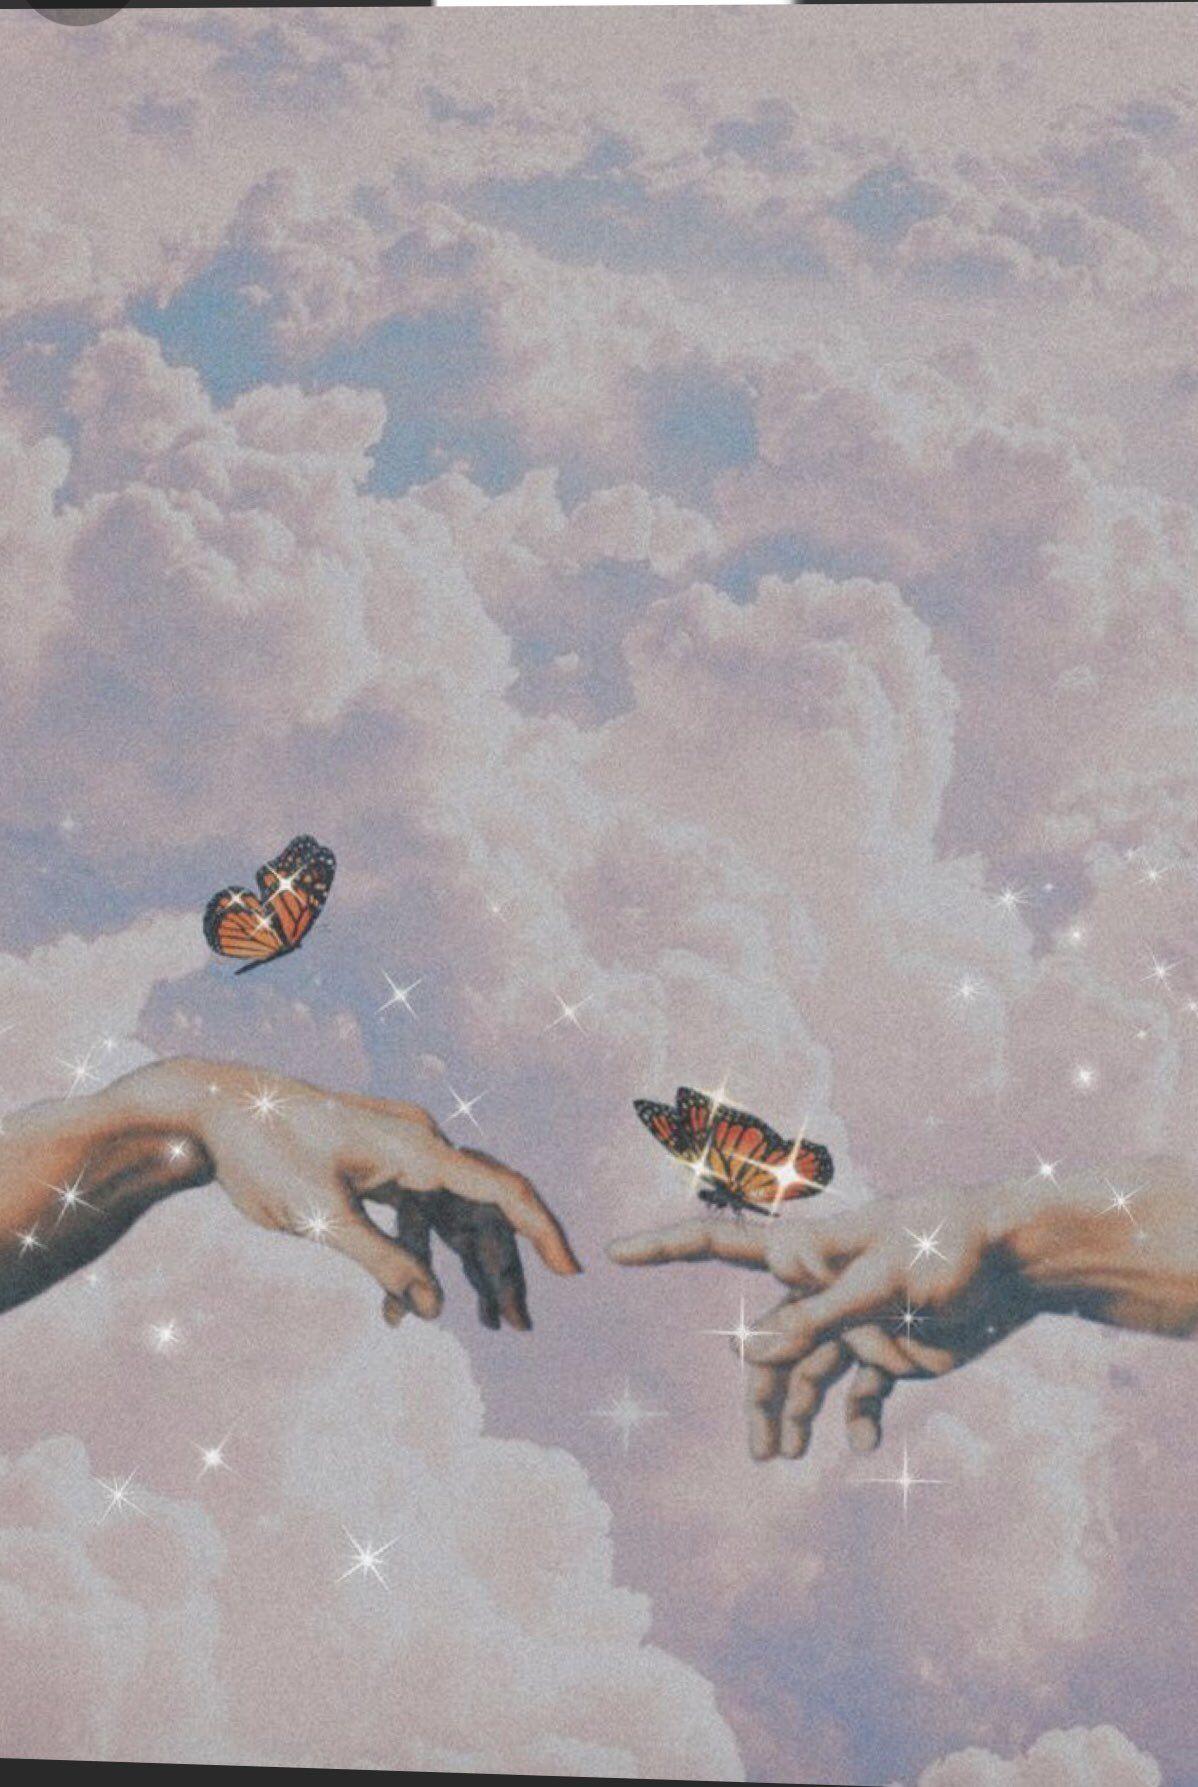 𝘎𝘢𝘭𝘭𝘦𝘳𝘪𝘢 𝘎𝘢𝘳𝘪𝘣𝘢𝘭𝘥𝘪 On Twitter Butterfly Wallpaper Iphone Aesthetic Iphone Wallpaper Angel Wallpaper